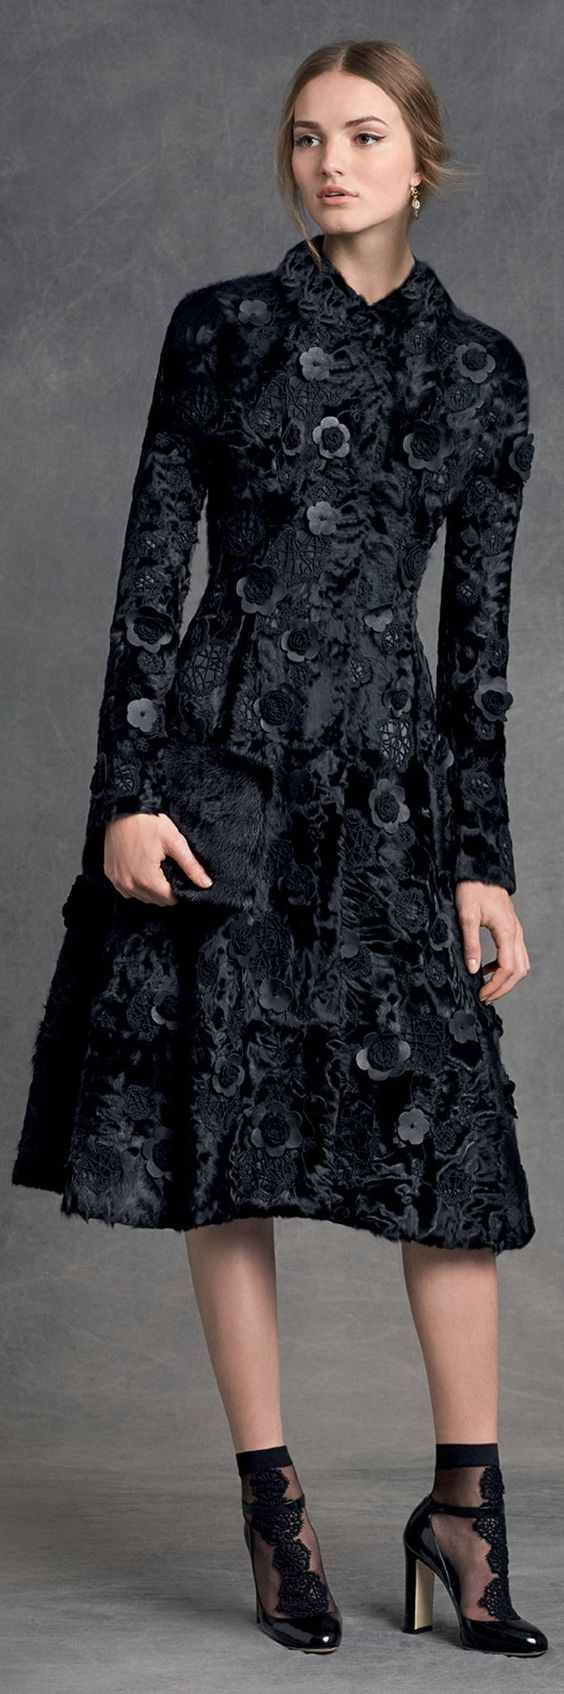 Dolce & Gabbana, Winter 2016. Latest fancy clothes for girl by newlatestfashion.com http://newlatestfashion.com/